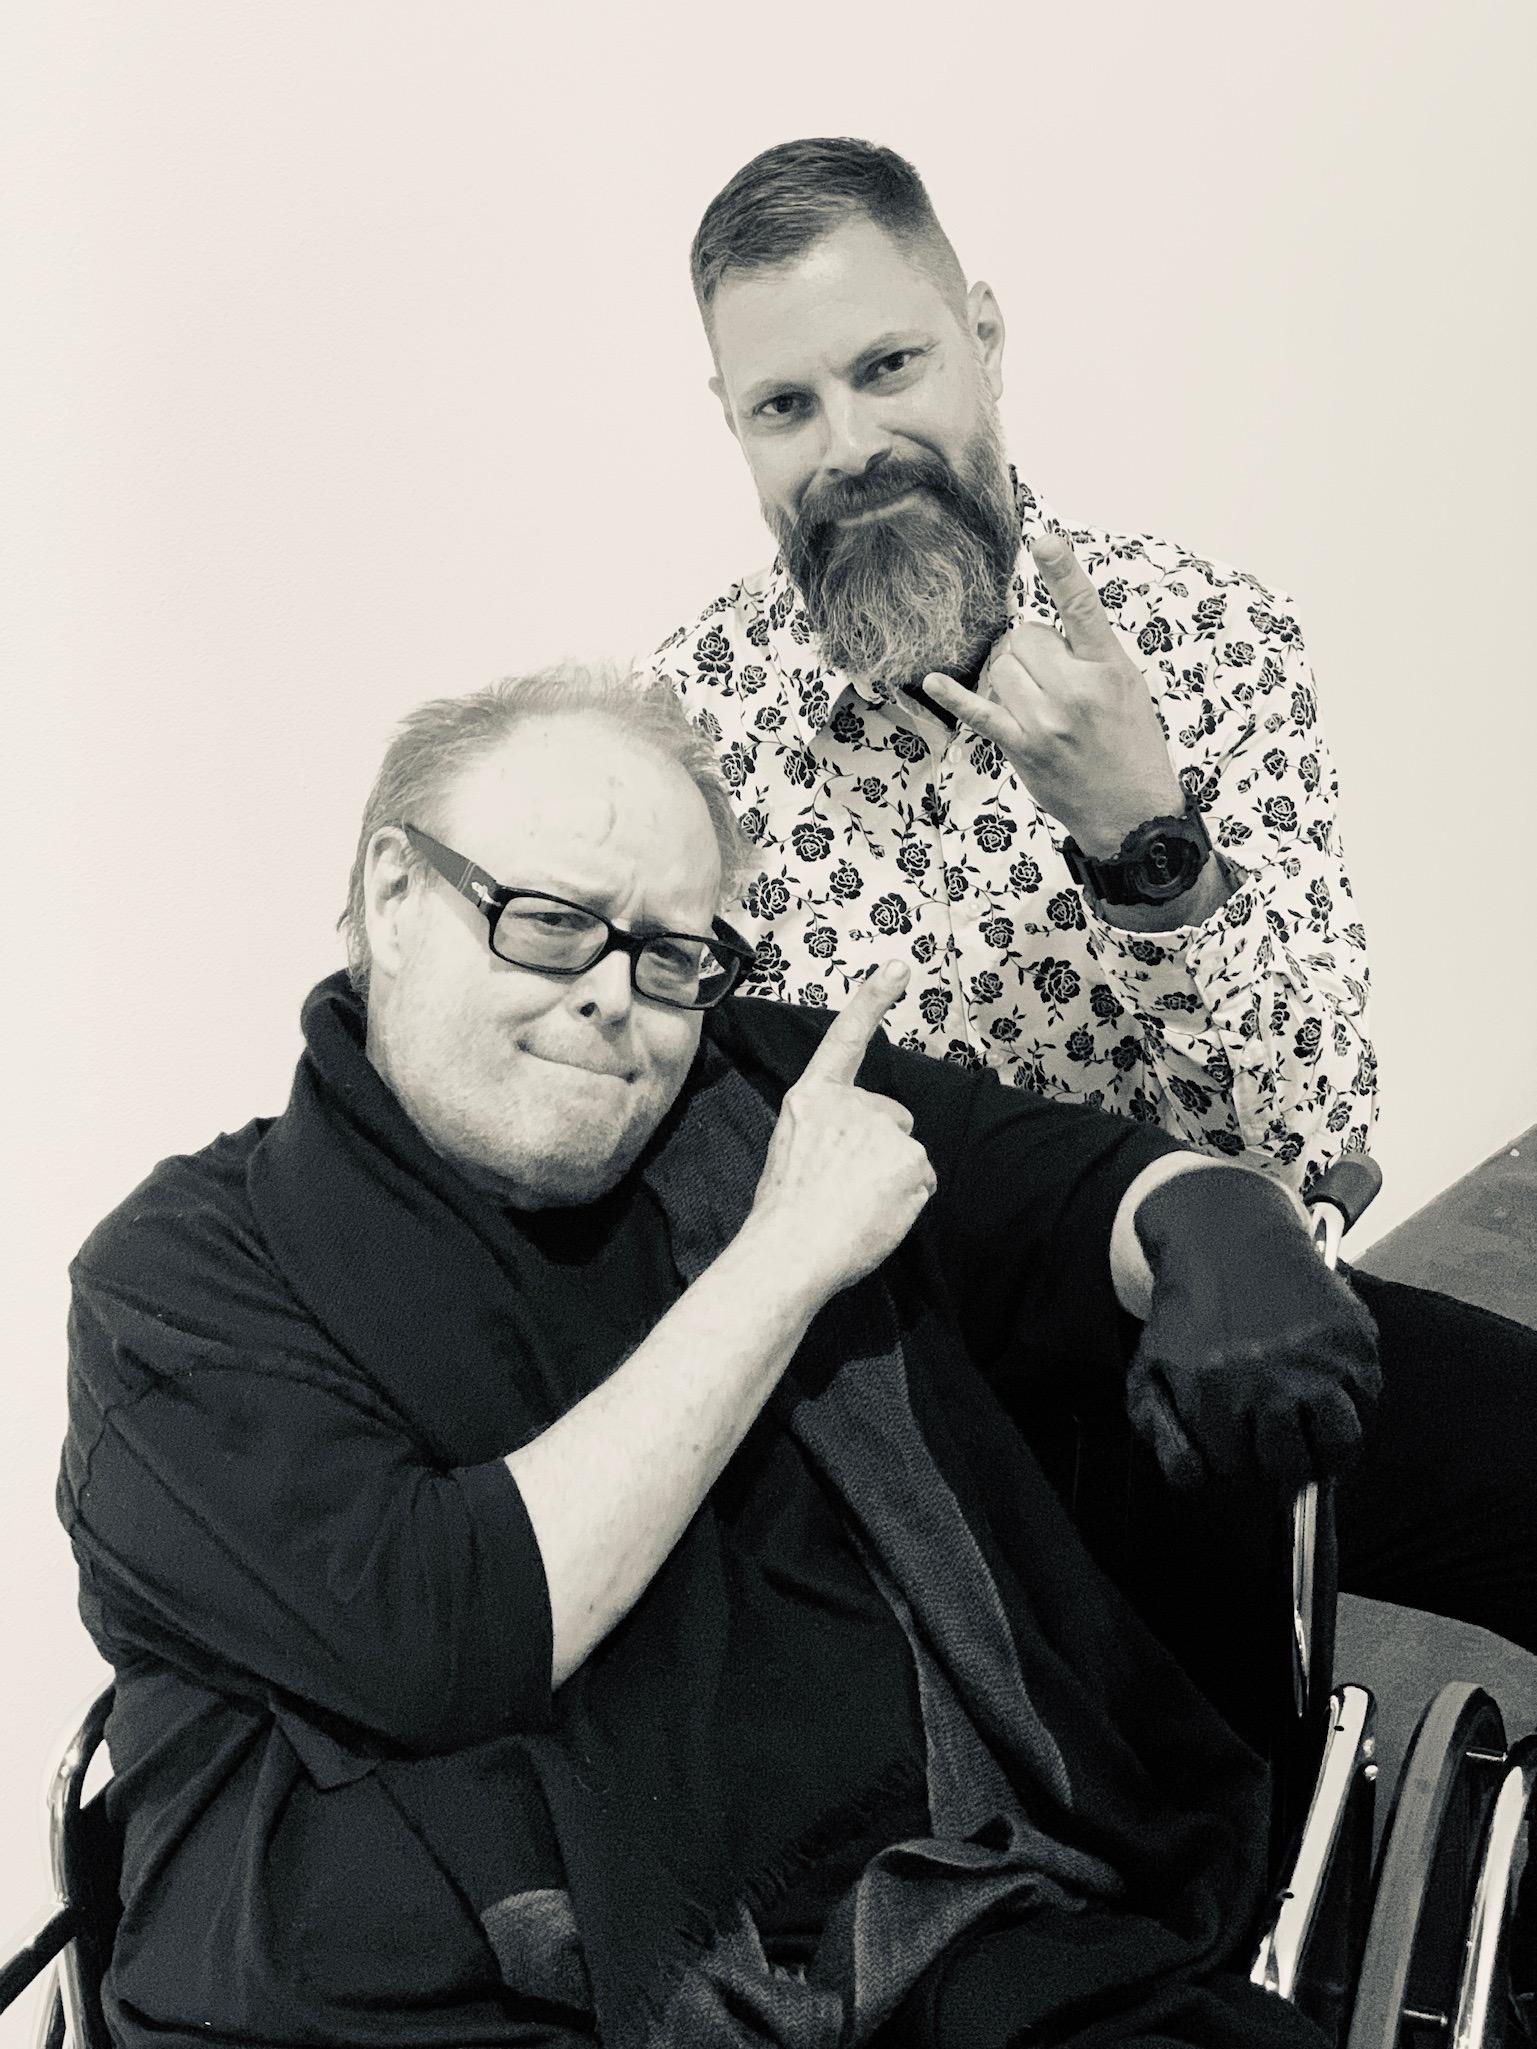 With Patrick, photo by Niku Kashef